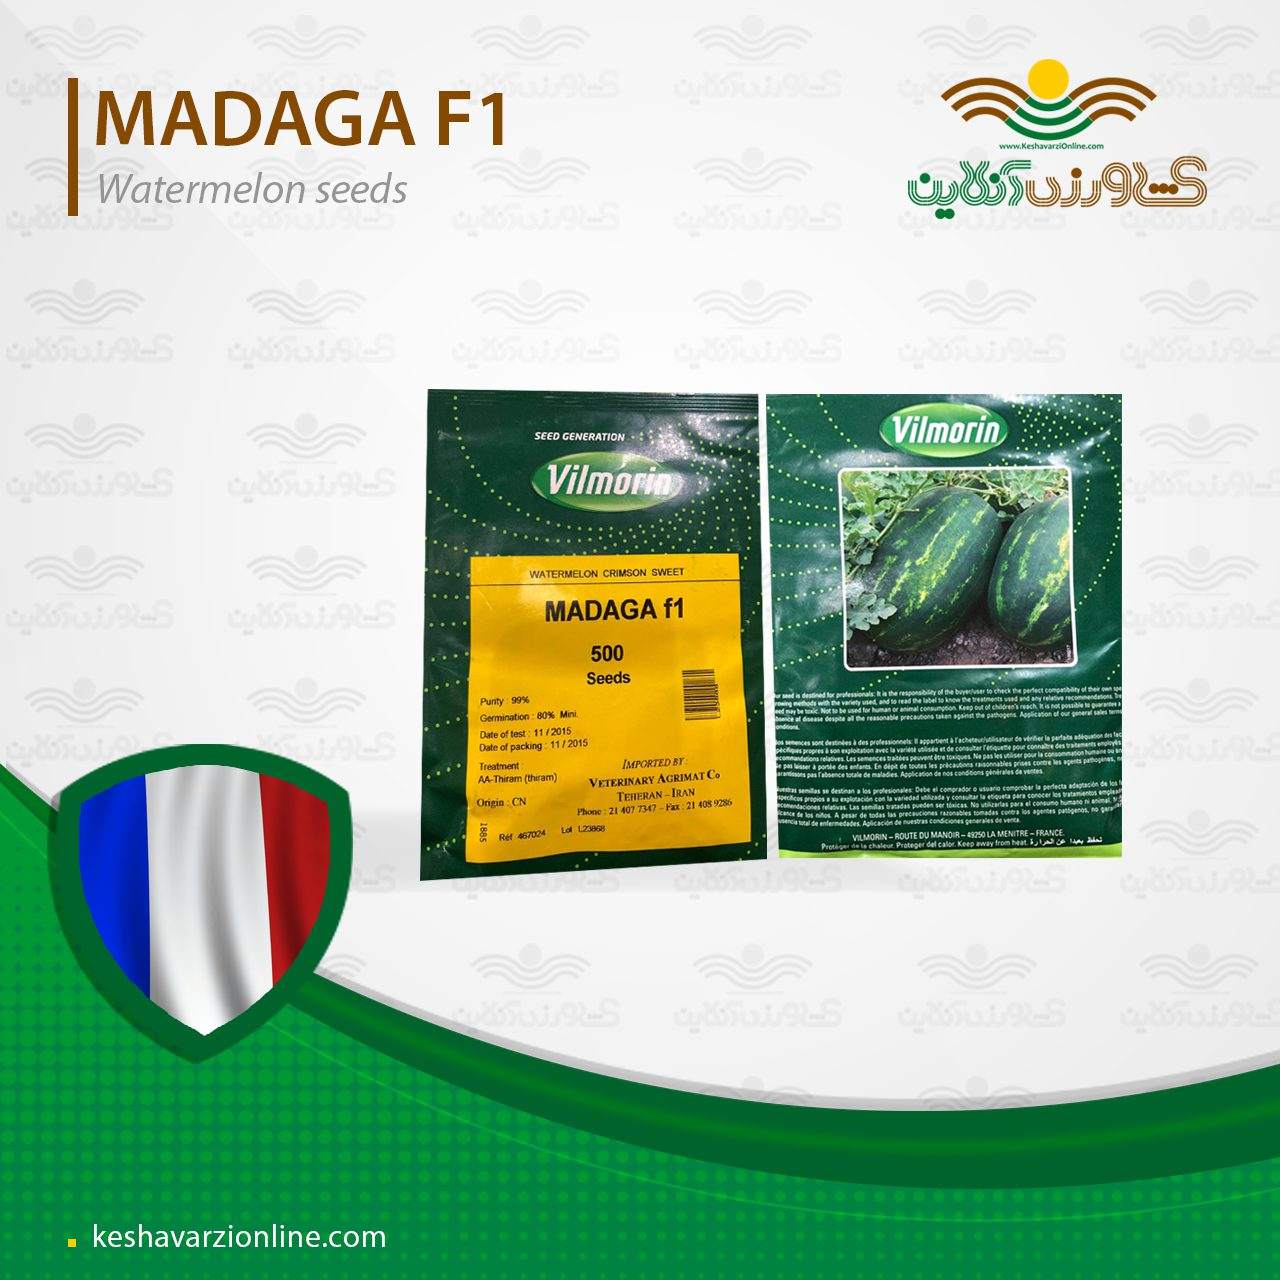 بذر هندوانه کریمسون ویلمورین ماداگا هیبرید اف یک 500 عددی